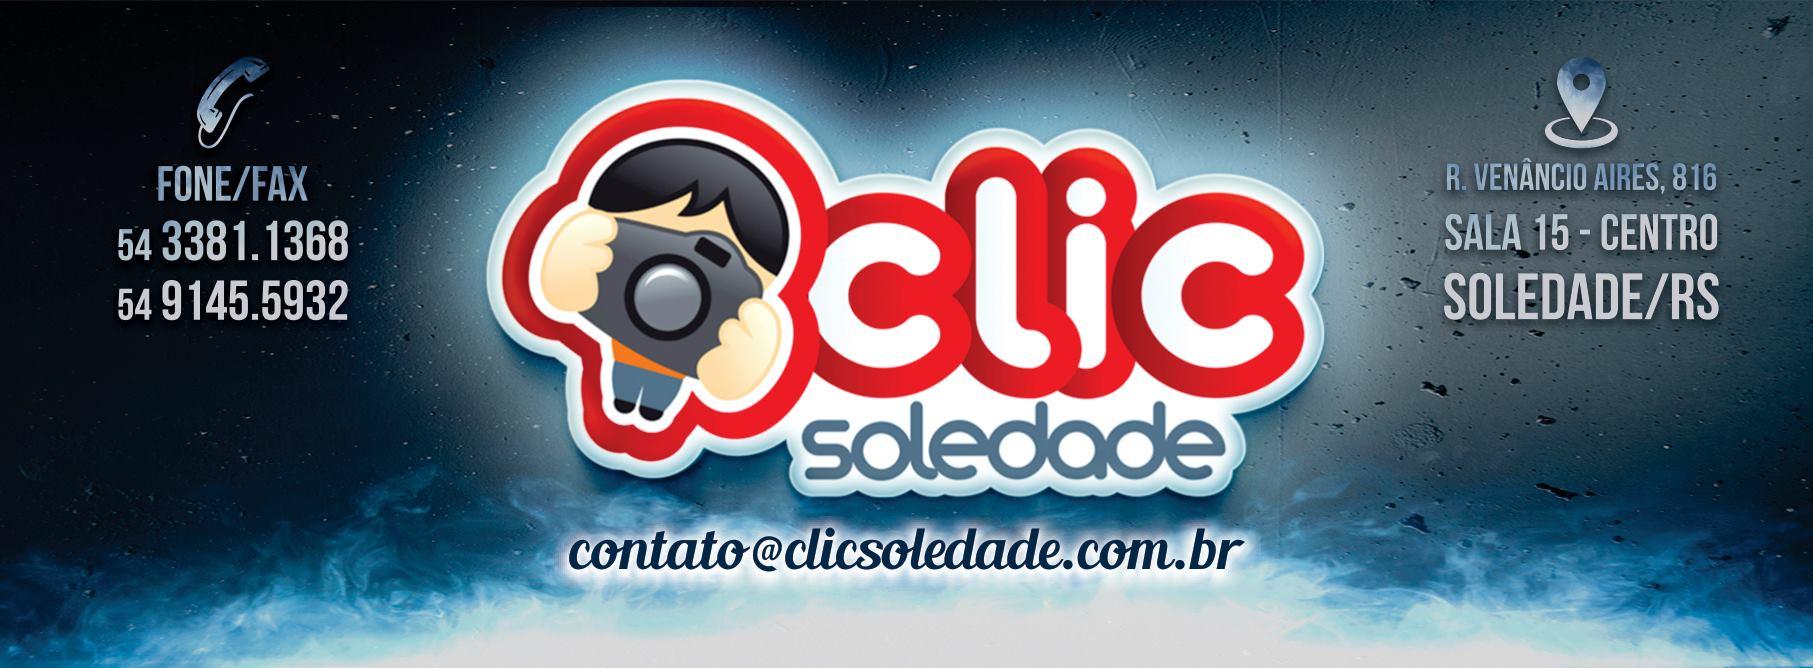 Artigos Portal ClicSoledade